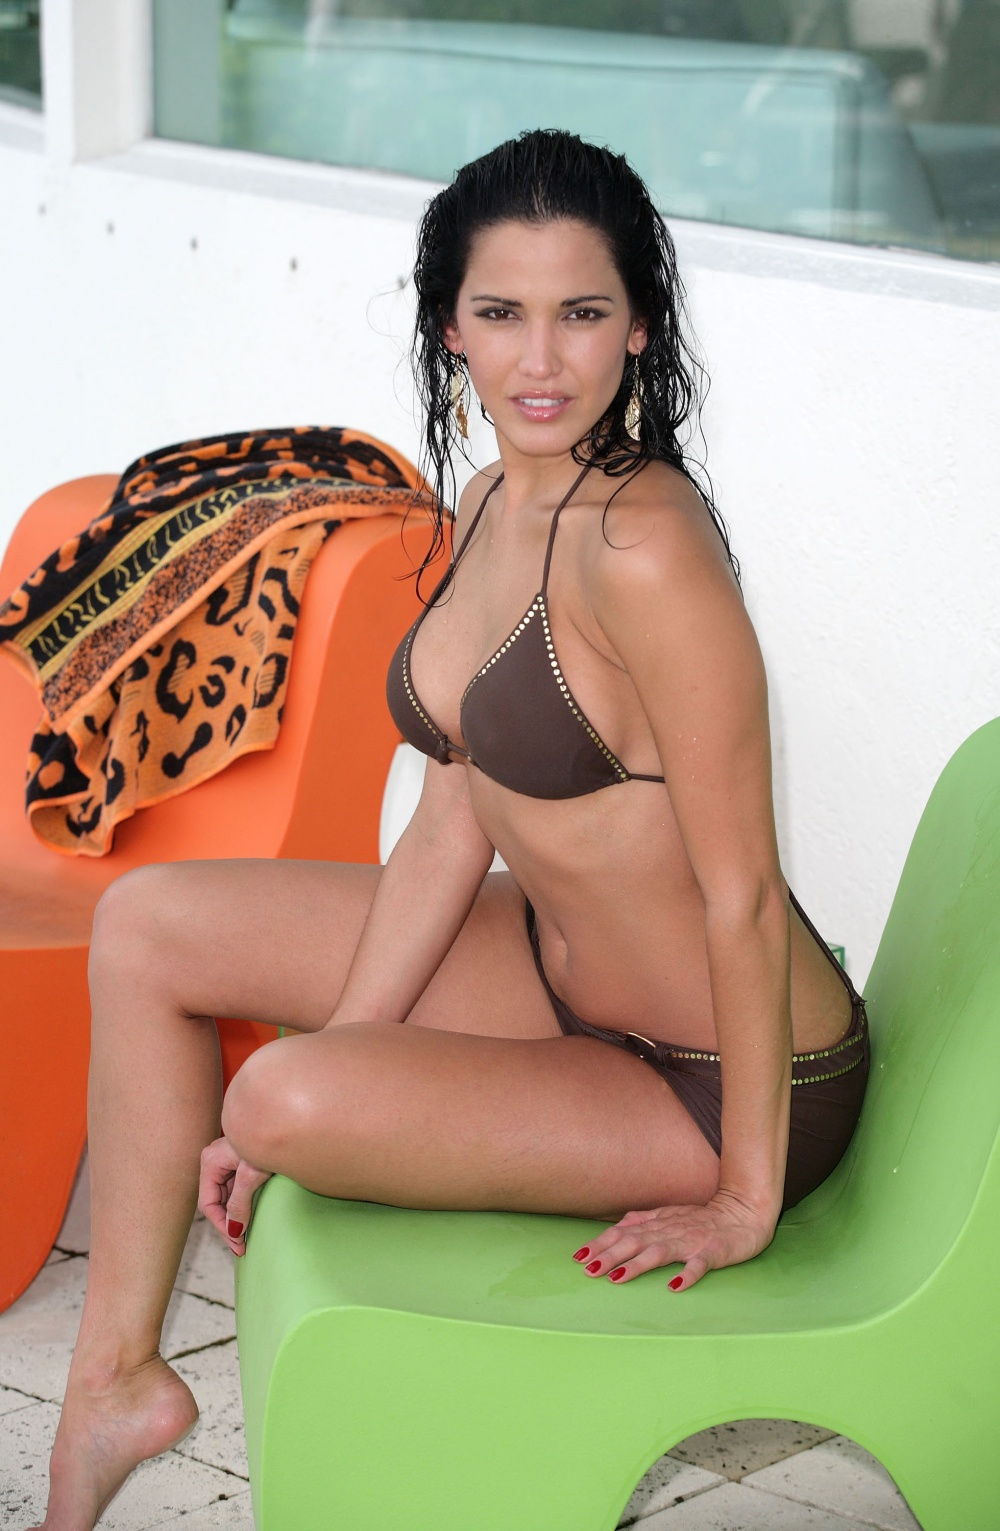 Olivia nice have a big sexy ass 7